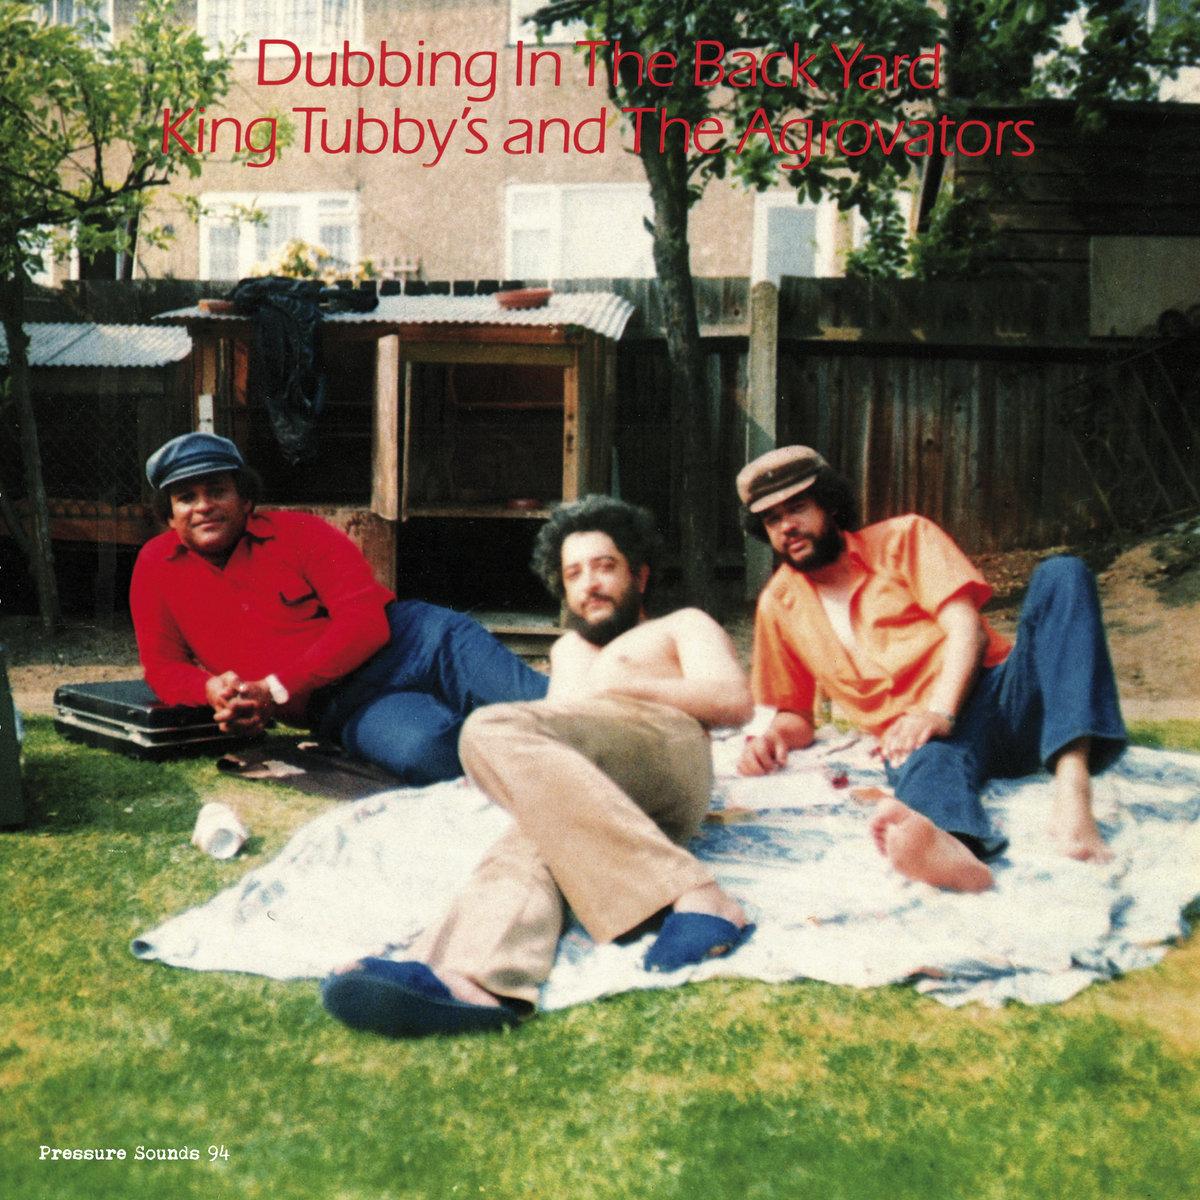 Dubbing In The Backyard